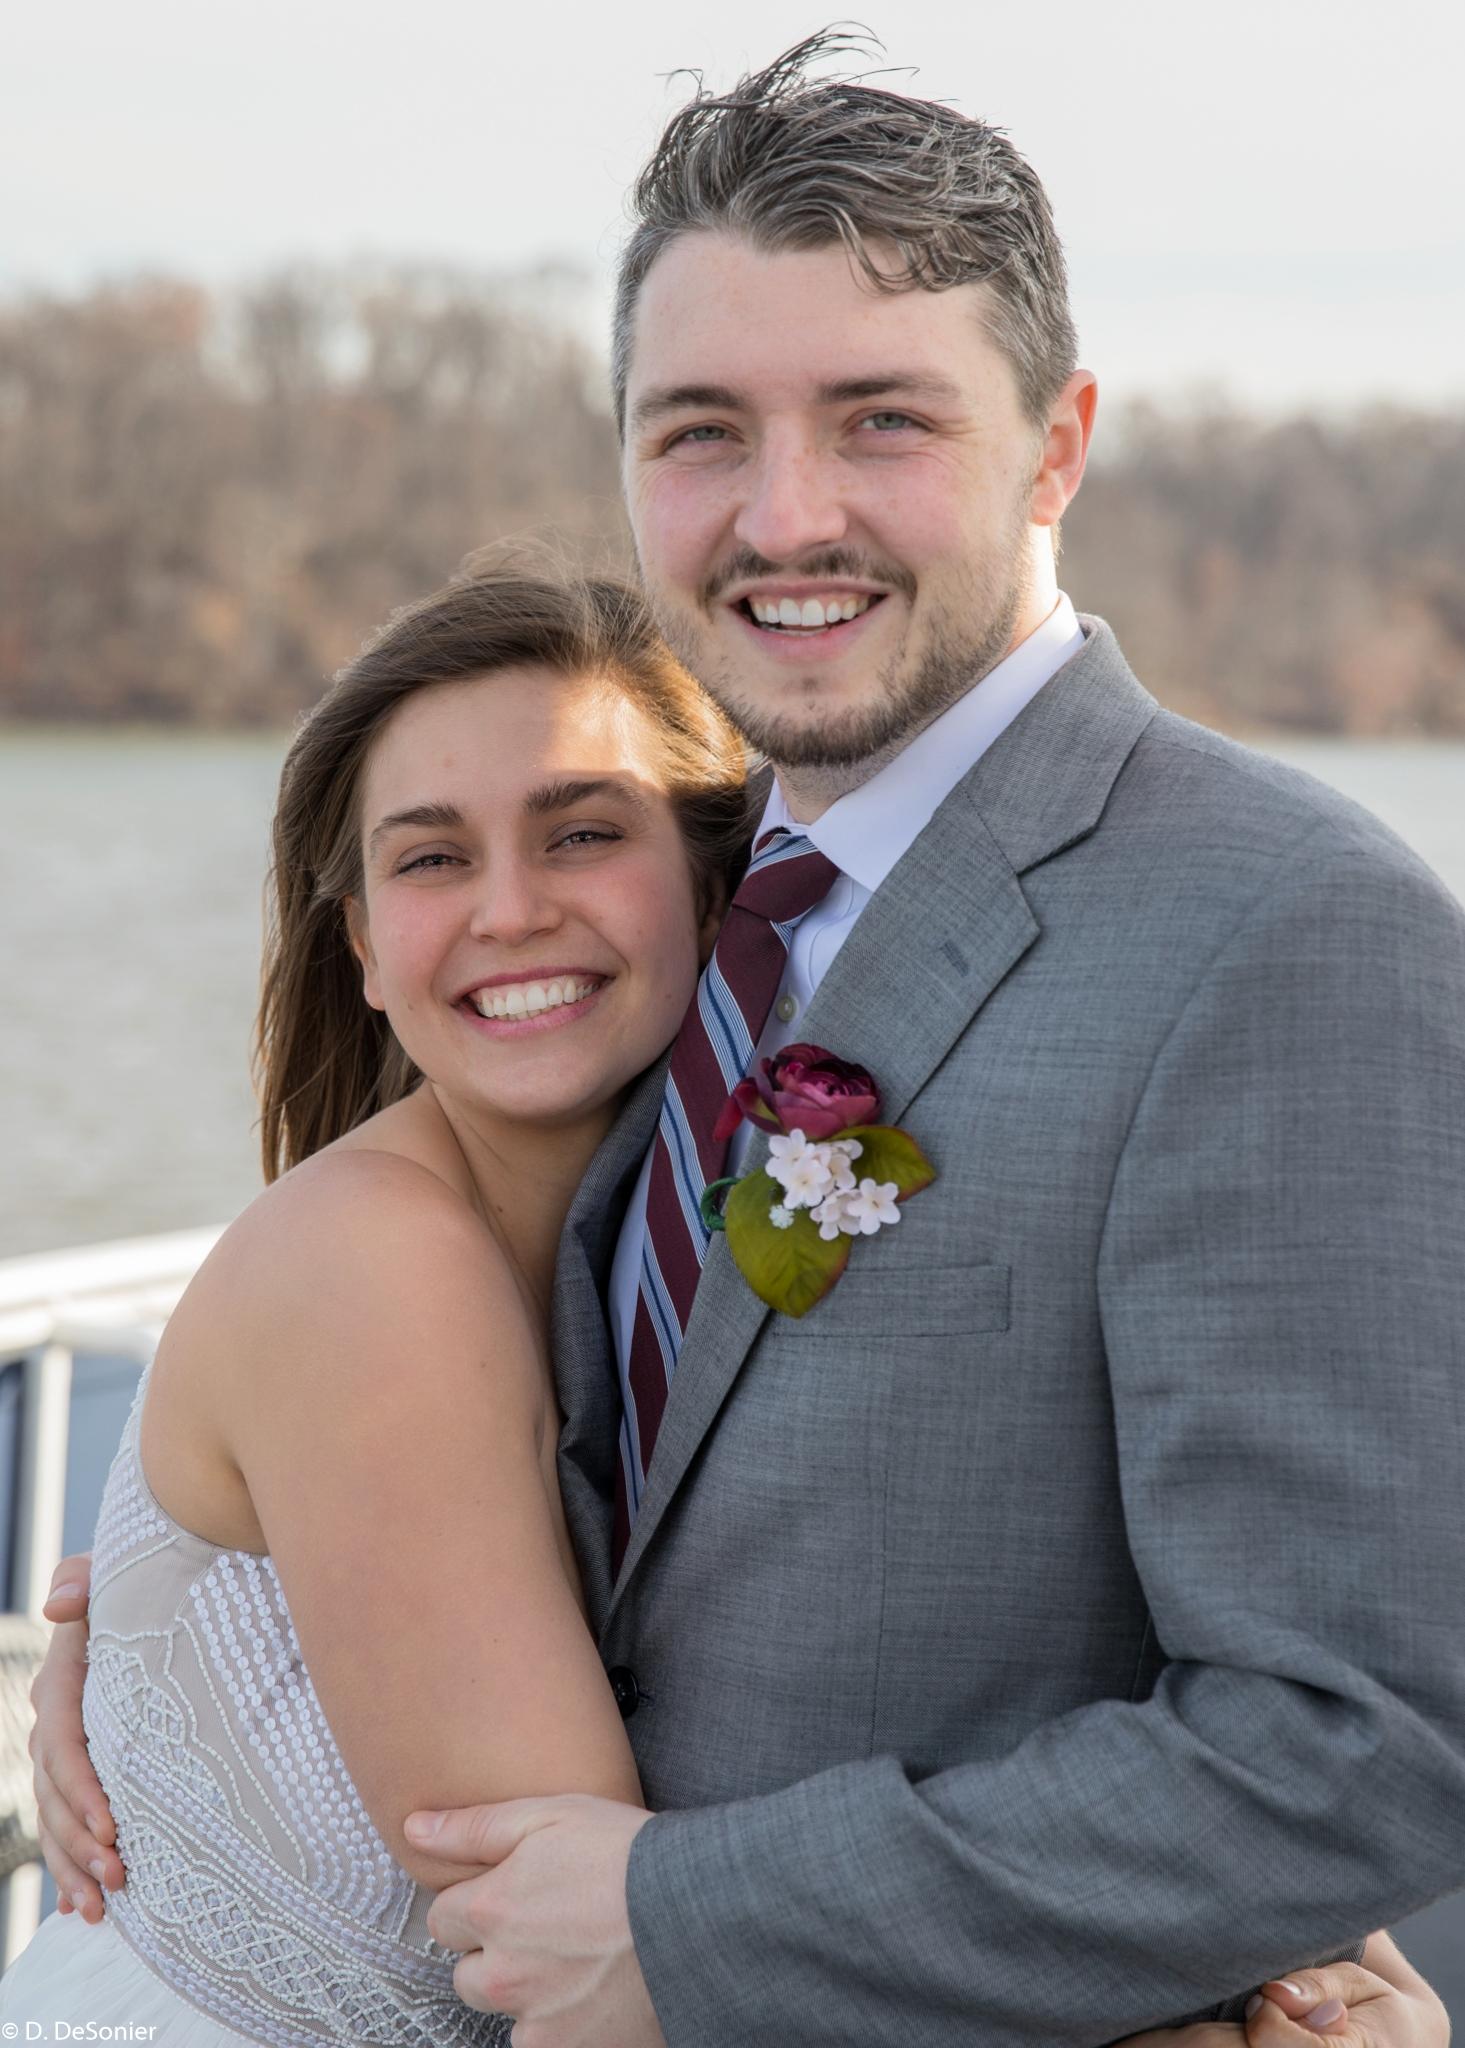 Josh and Sharlotte at their wedding near Washington DC.